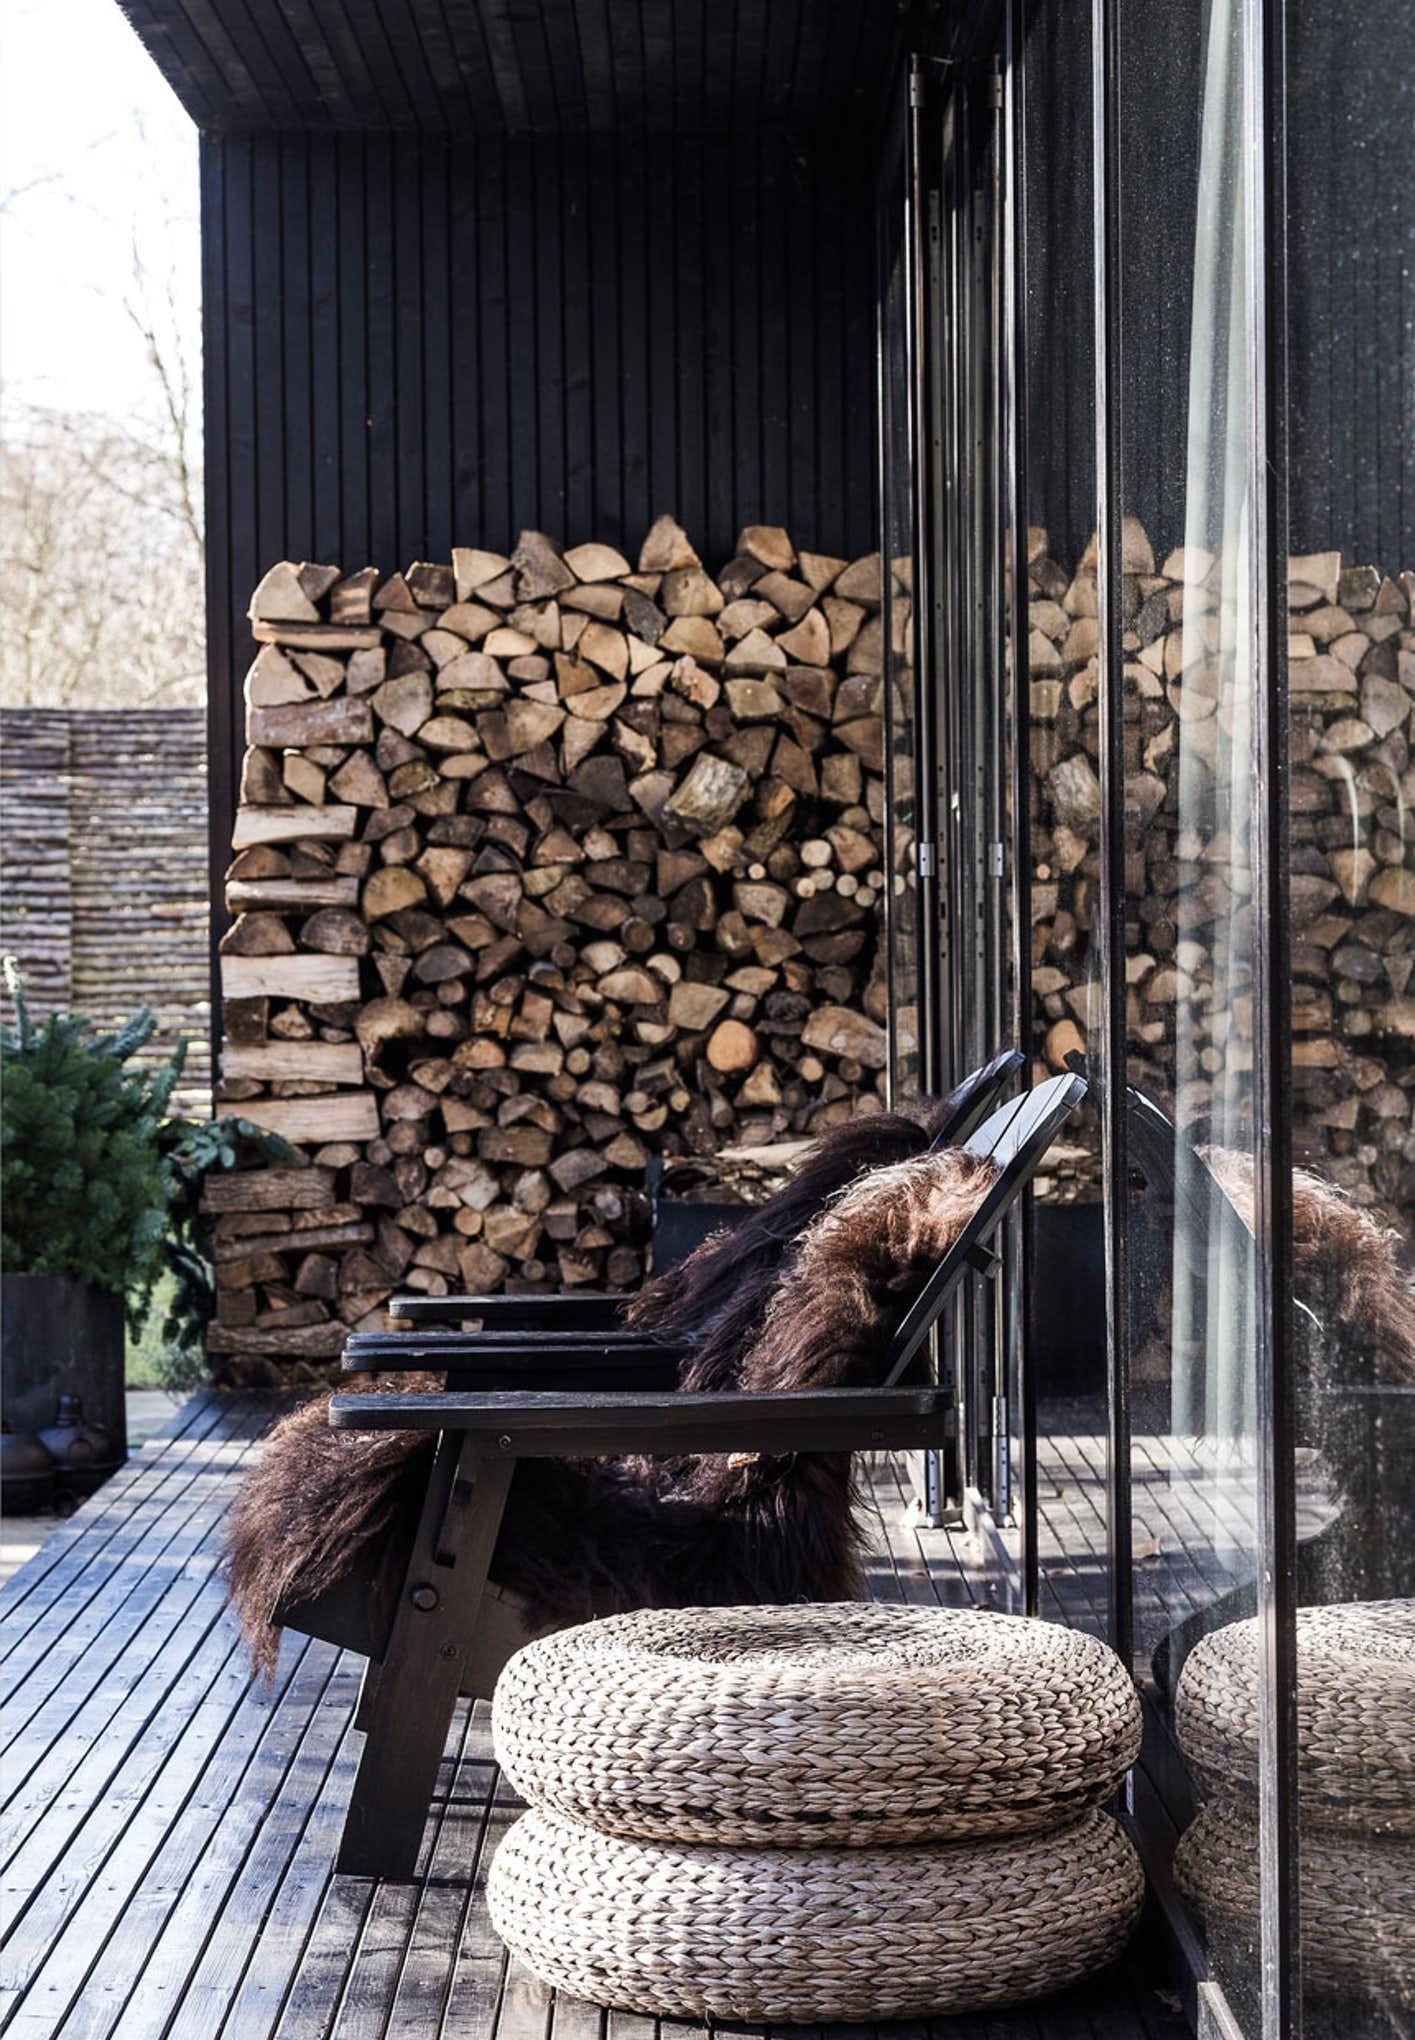 Arkitektens Hjemmetegnede Traesommerhus Hygge Home Pinterest